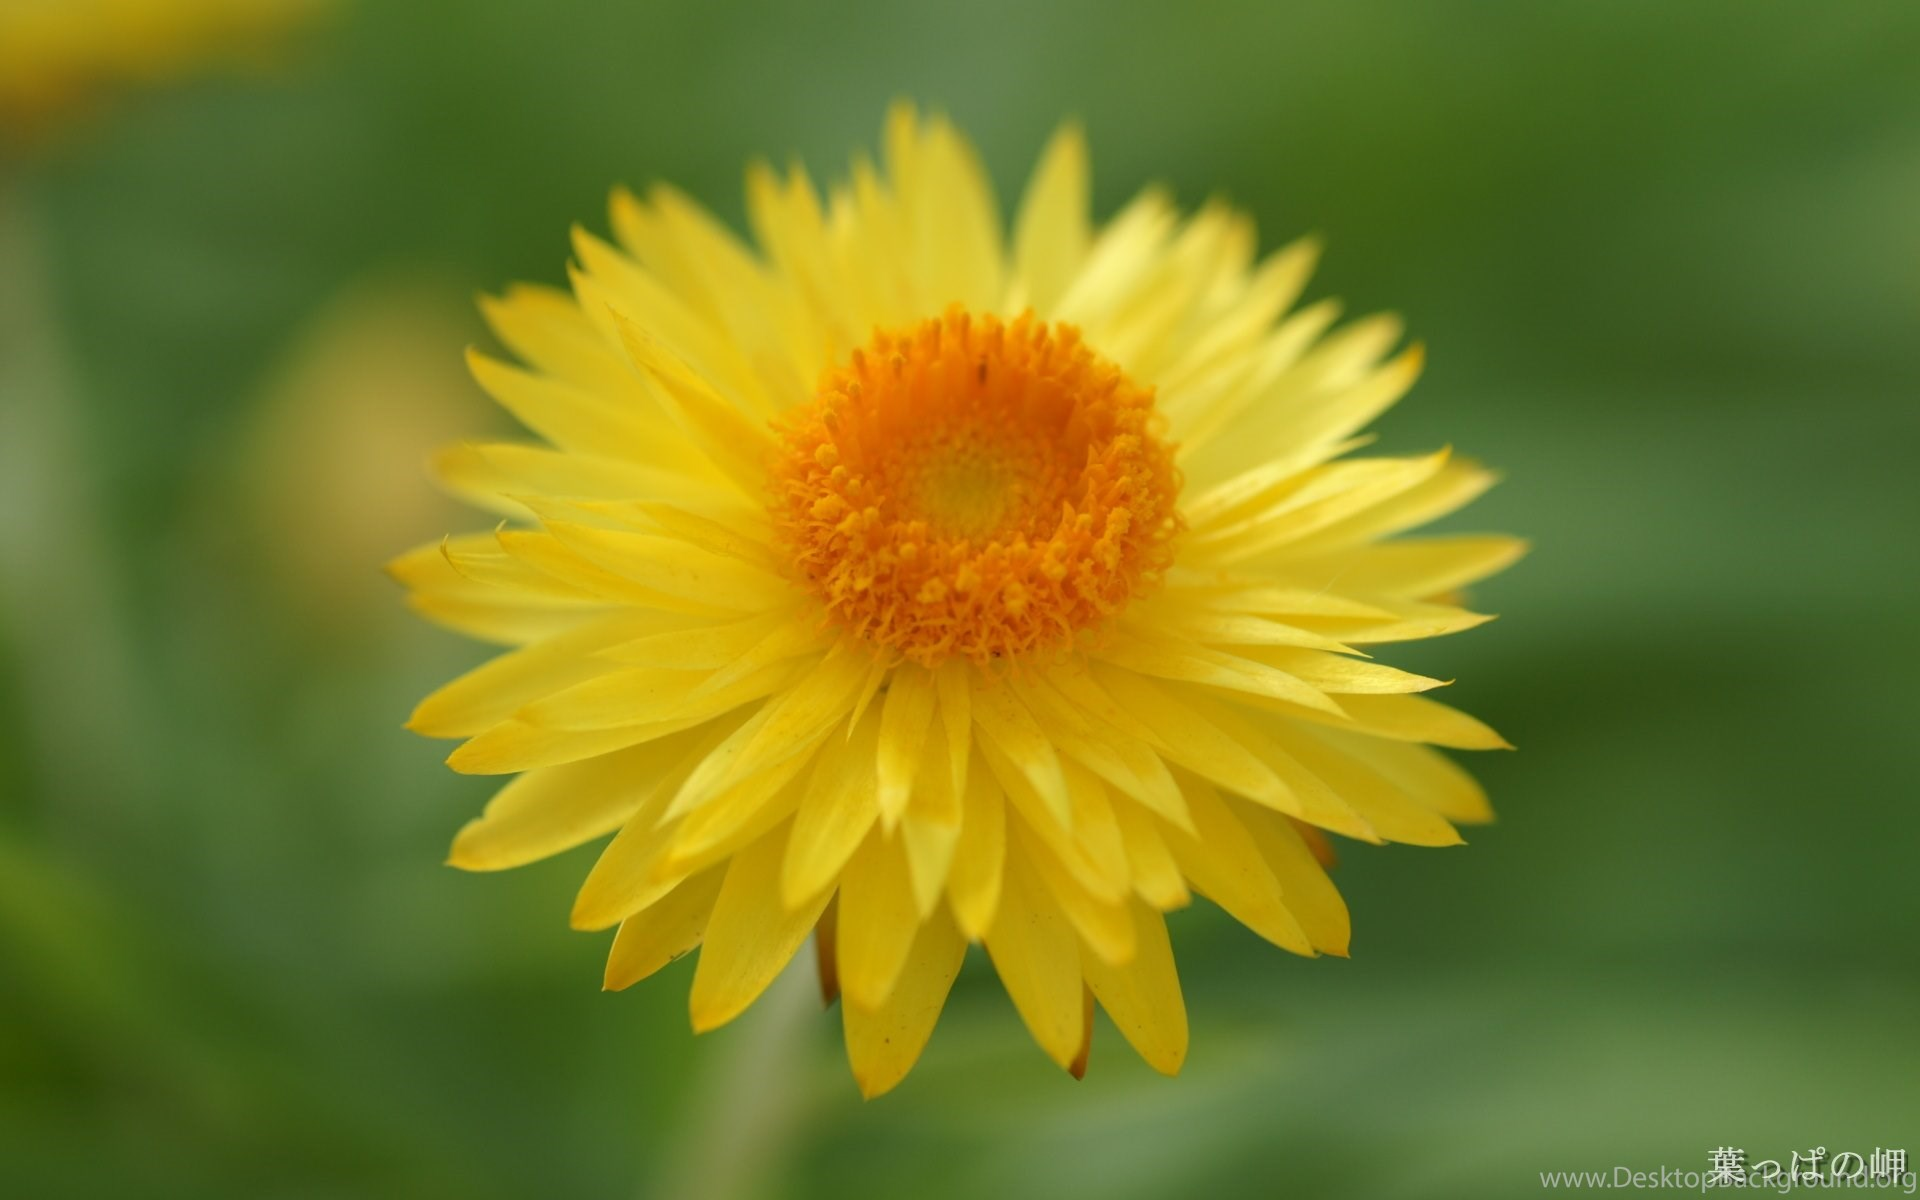 Most Beautiful Flowers Photos Wallpapers Hd Wide Desktop Background